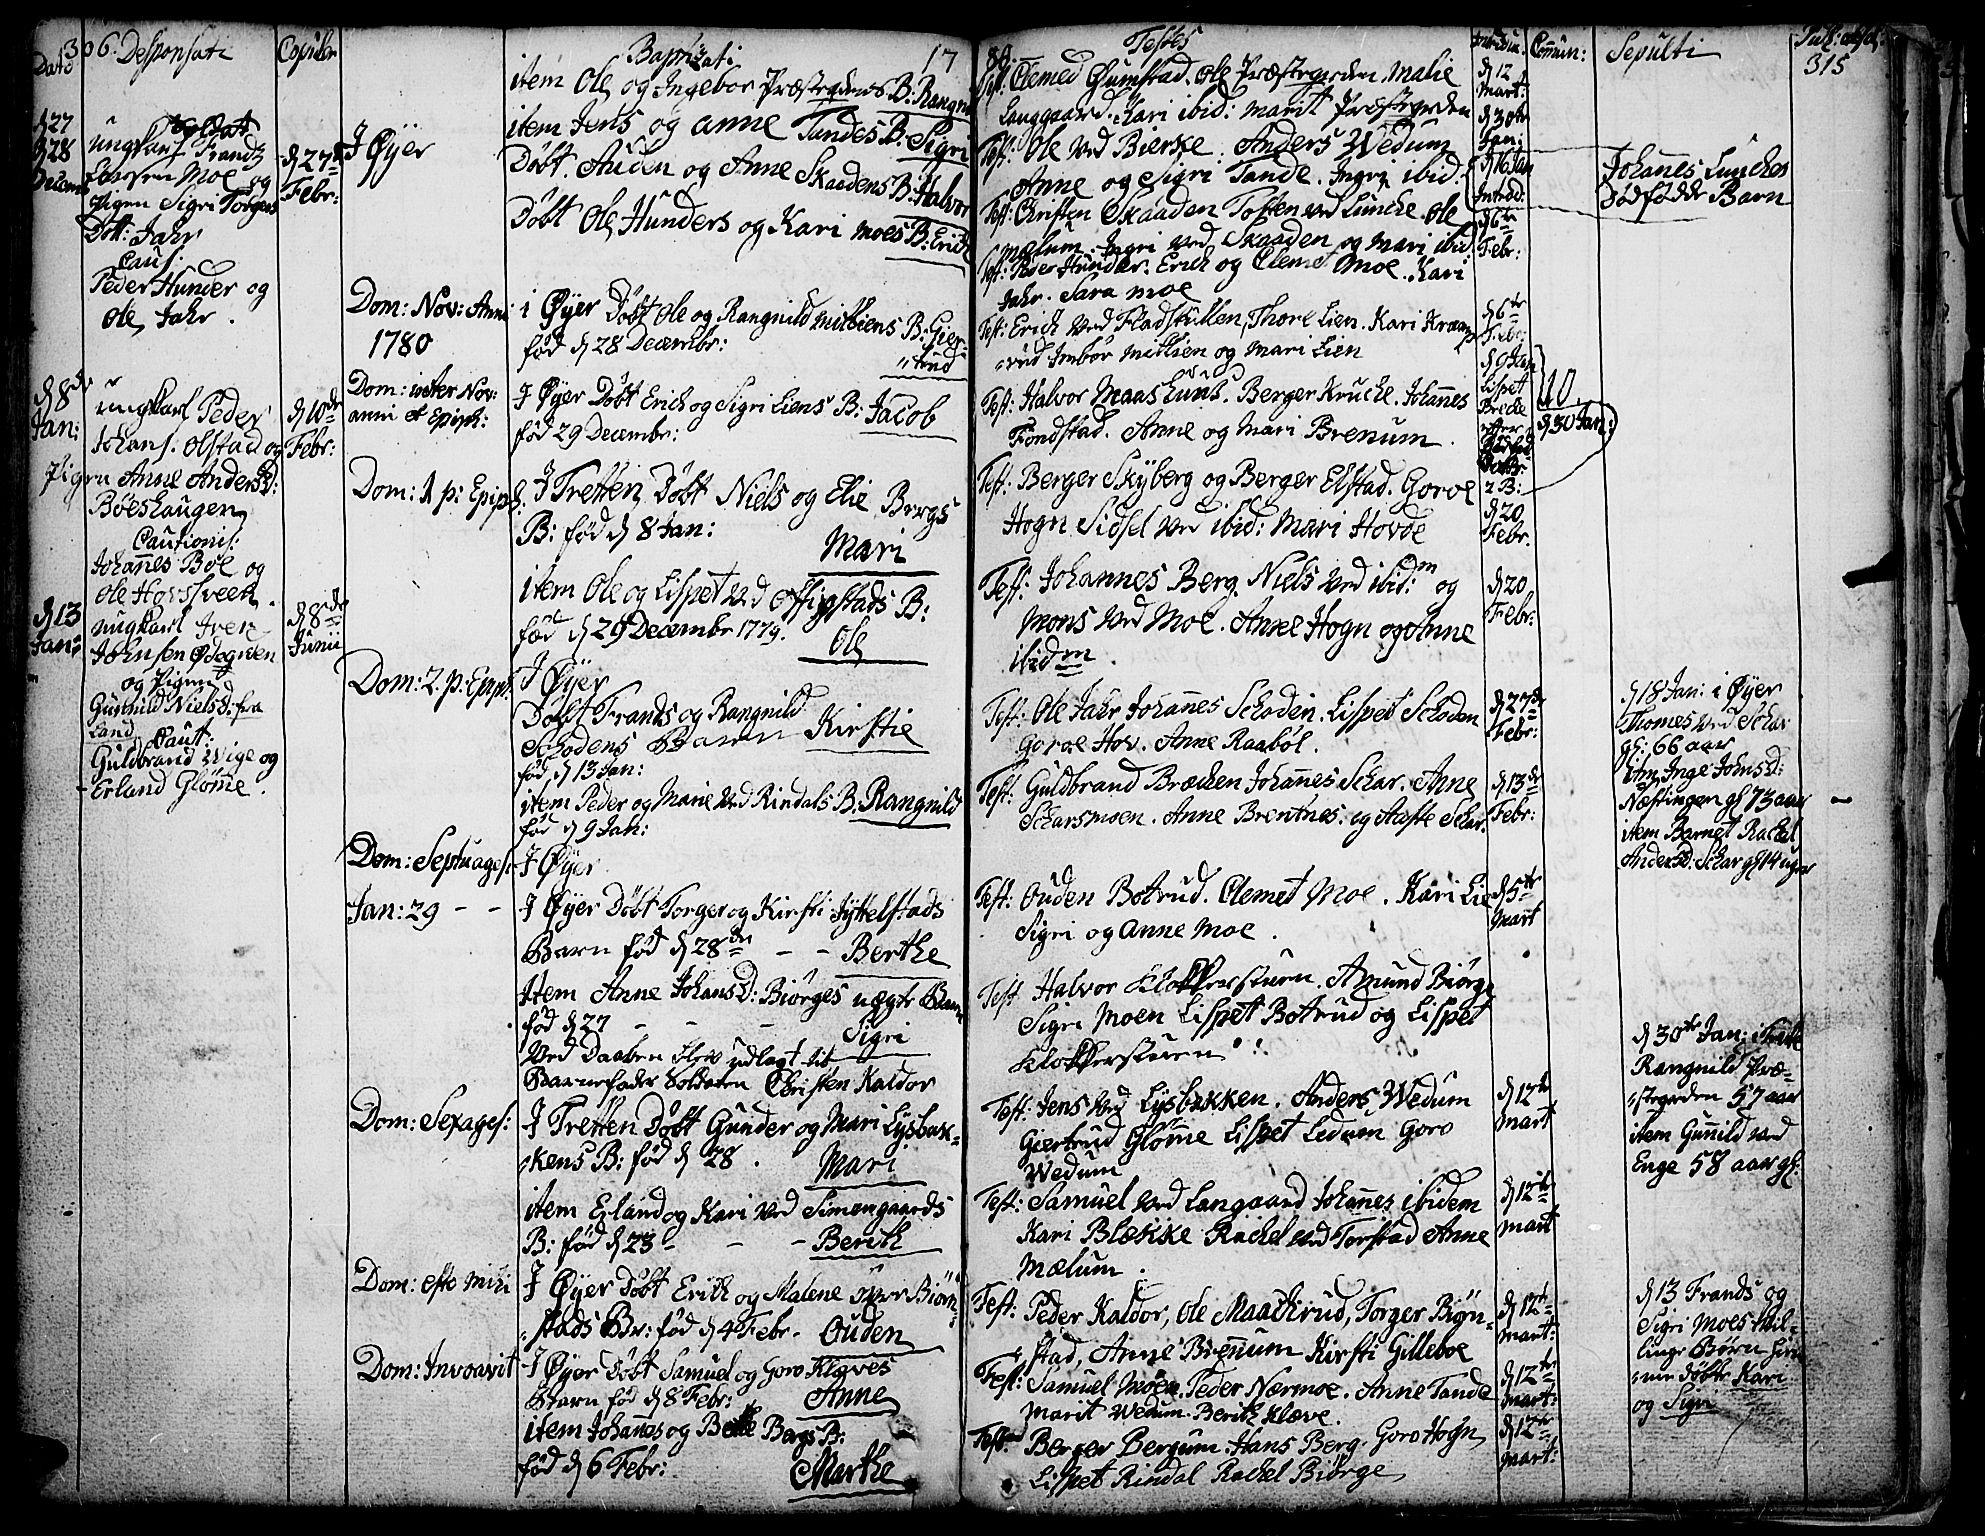 SAH, Øyer prestekontor, Ministerialbok nr. 2, 1733-1784, s. 306-315